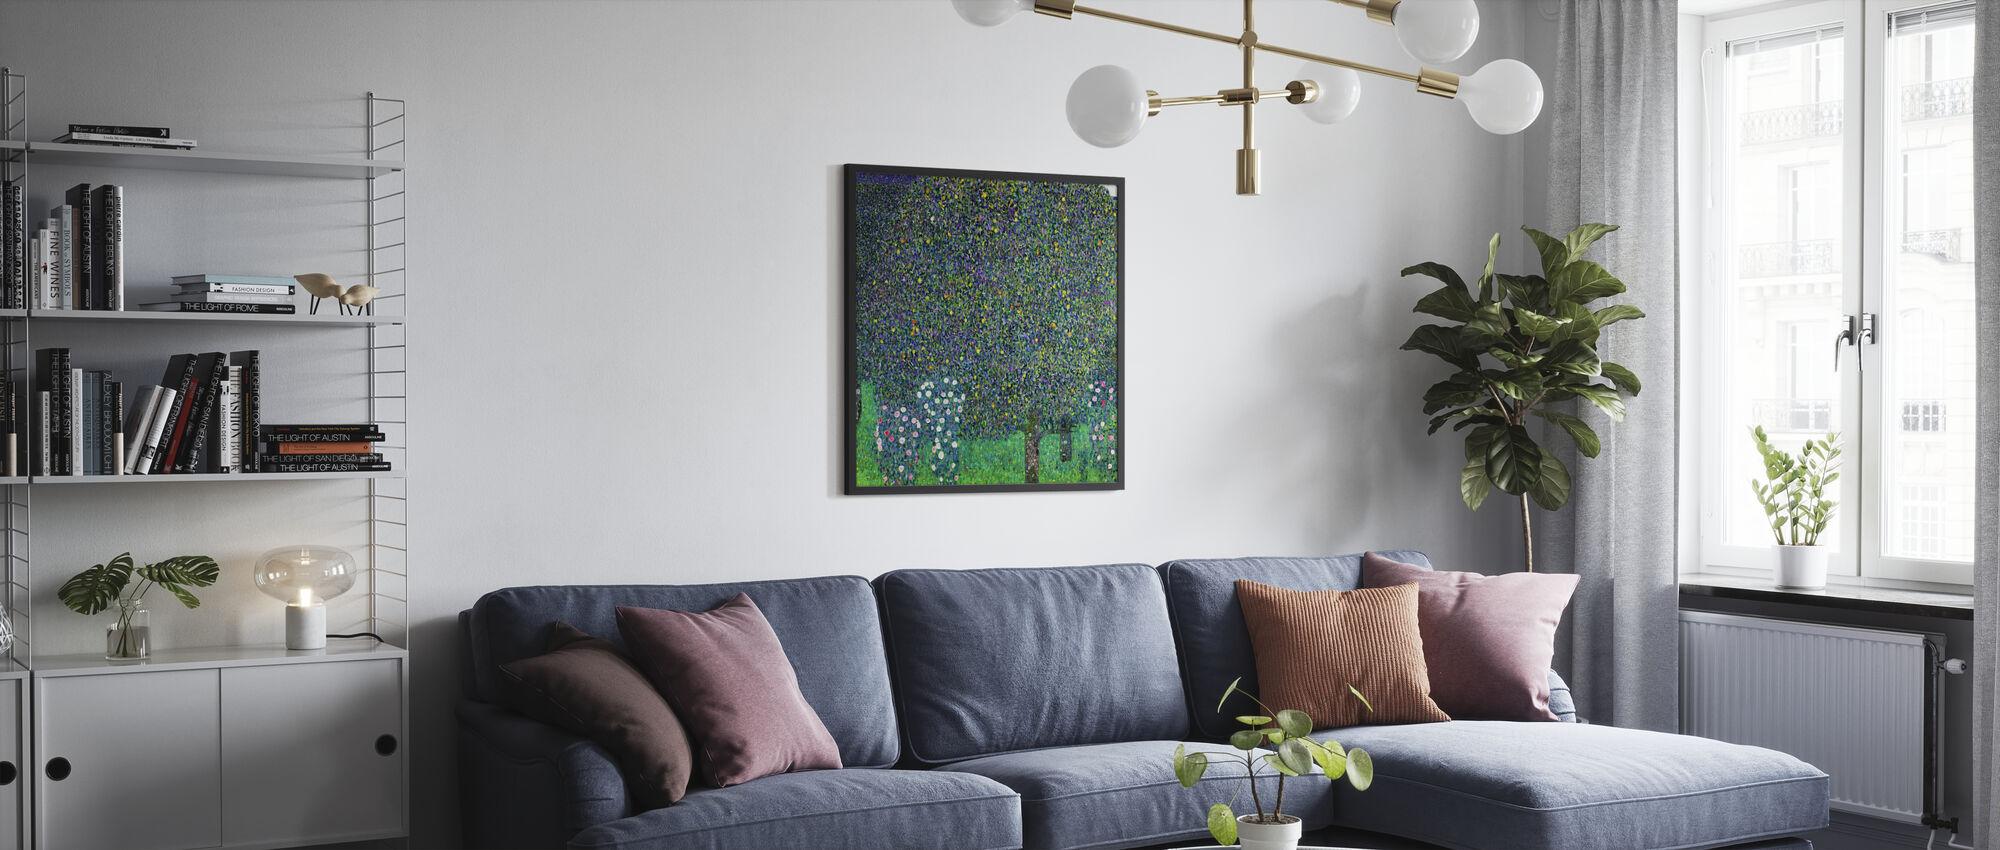 Bridge at Maincy, Gustav Klimt - Poster - Living Room